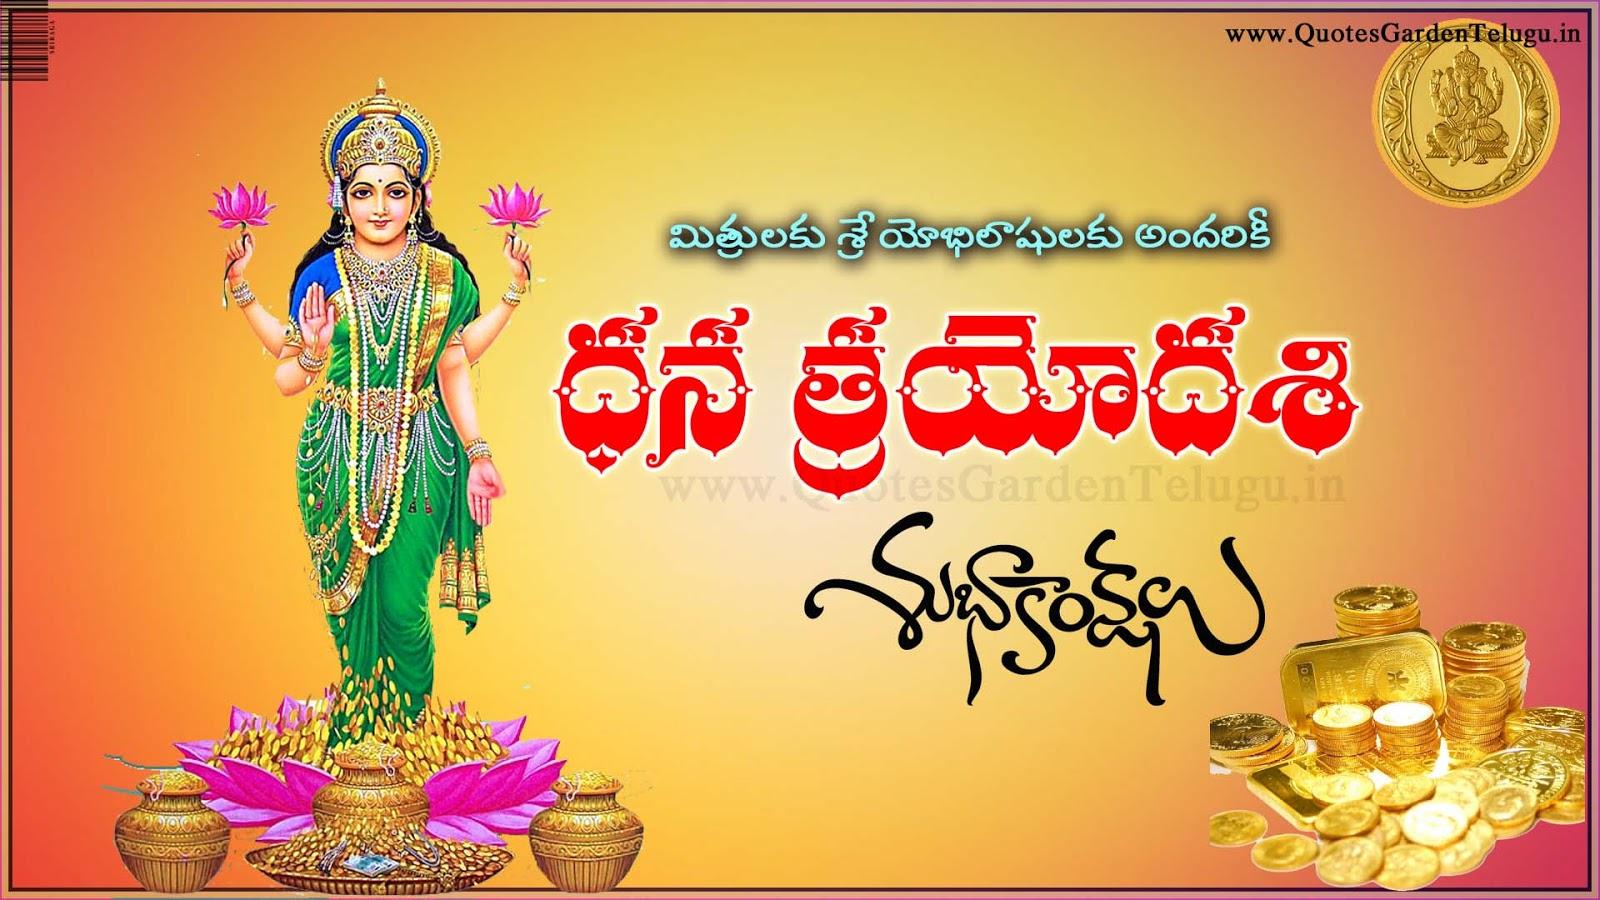 Dhana Trayodashi Greetings In Telugu Quotes Garden Telugu